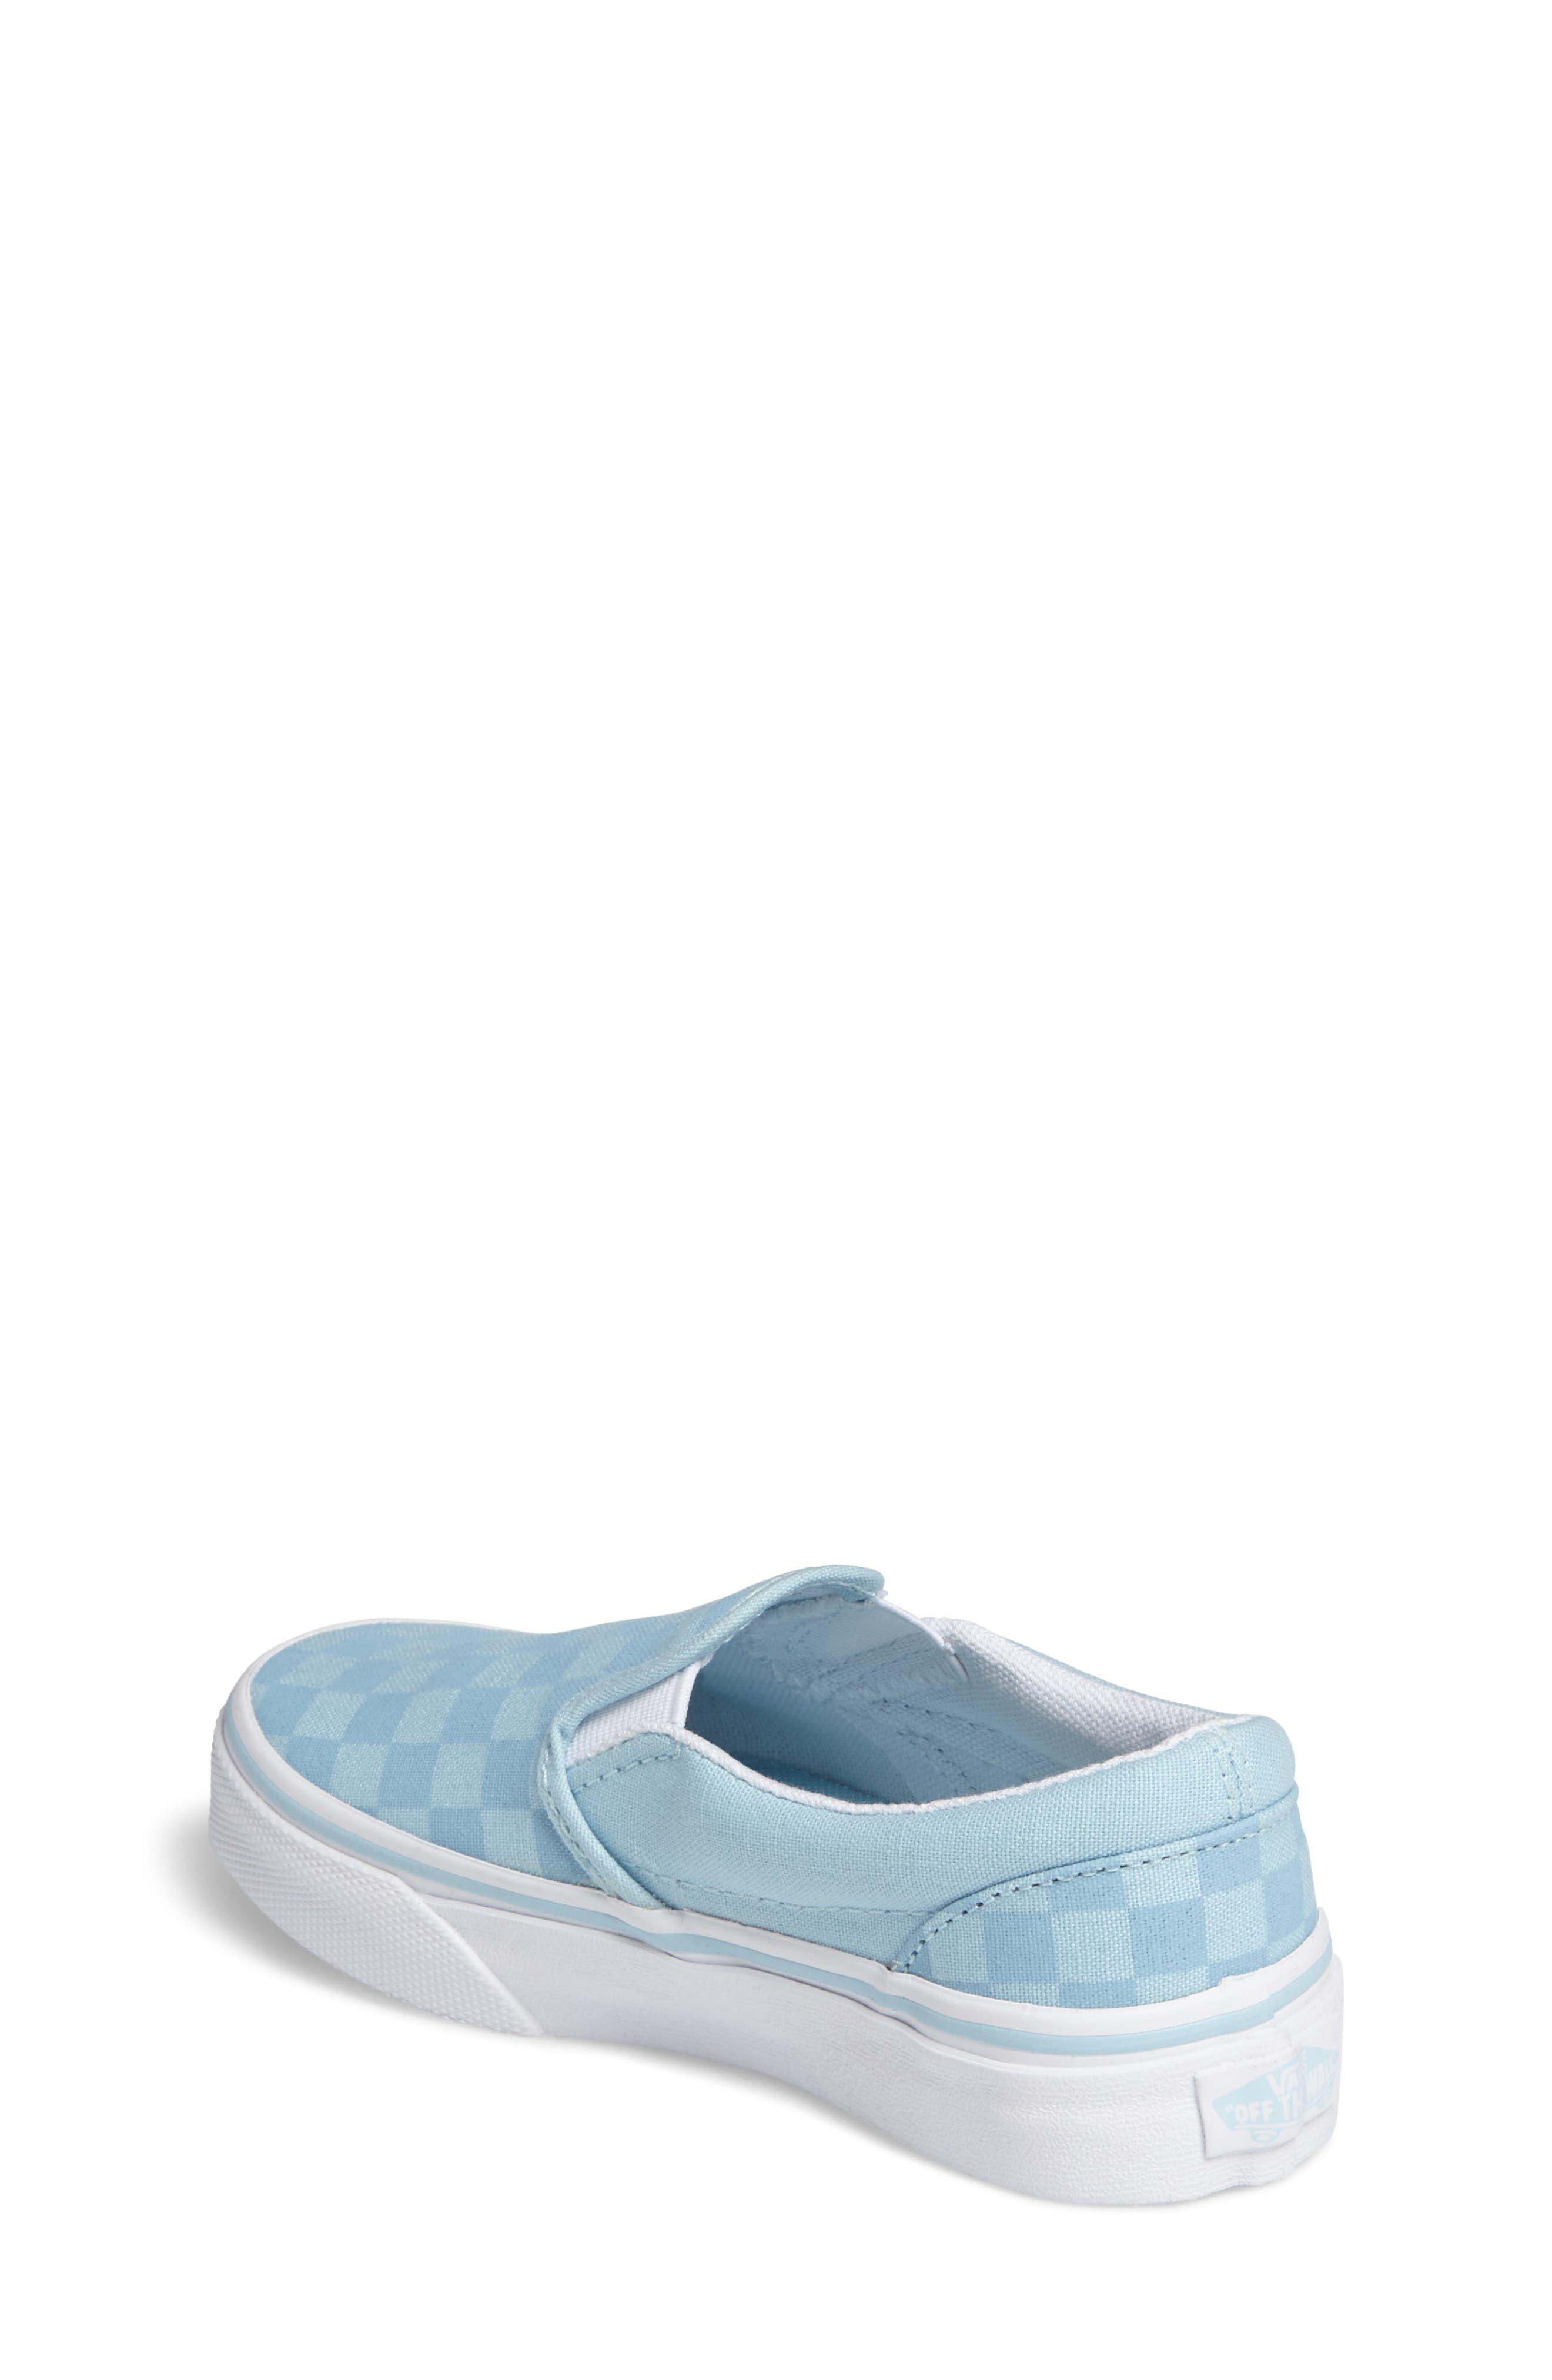 Classic Slip-On Sneaker,                             Alternate thumbnail 2, color,                             Crystal Blue Tonal Check